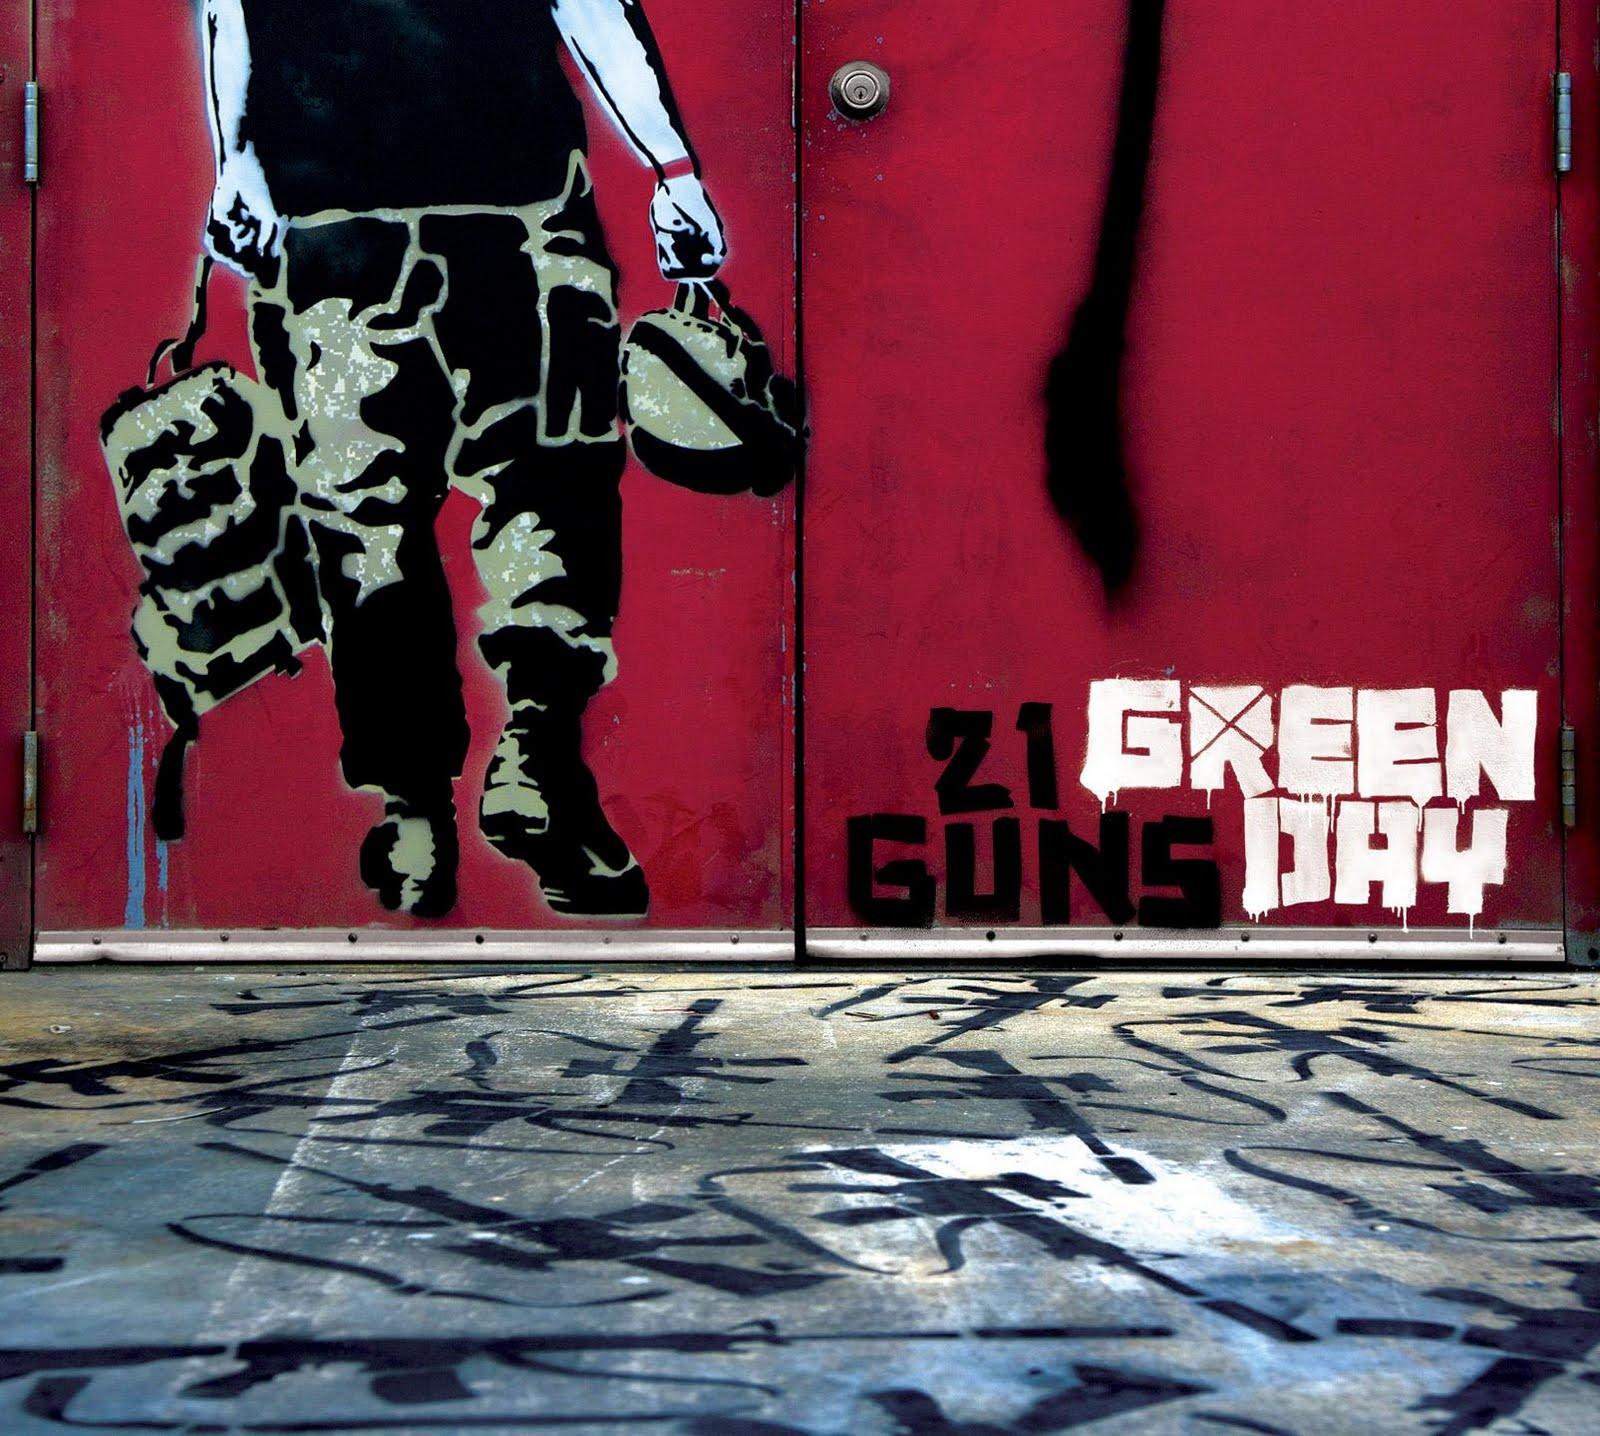 Greenday 21 Guns Guitar Chords Tabs Lyrics Song Facts Meaning